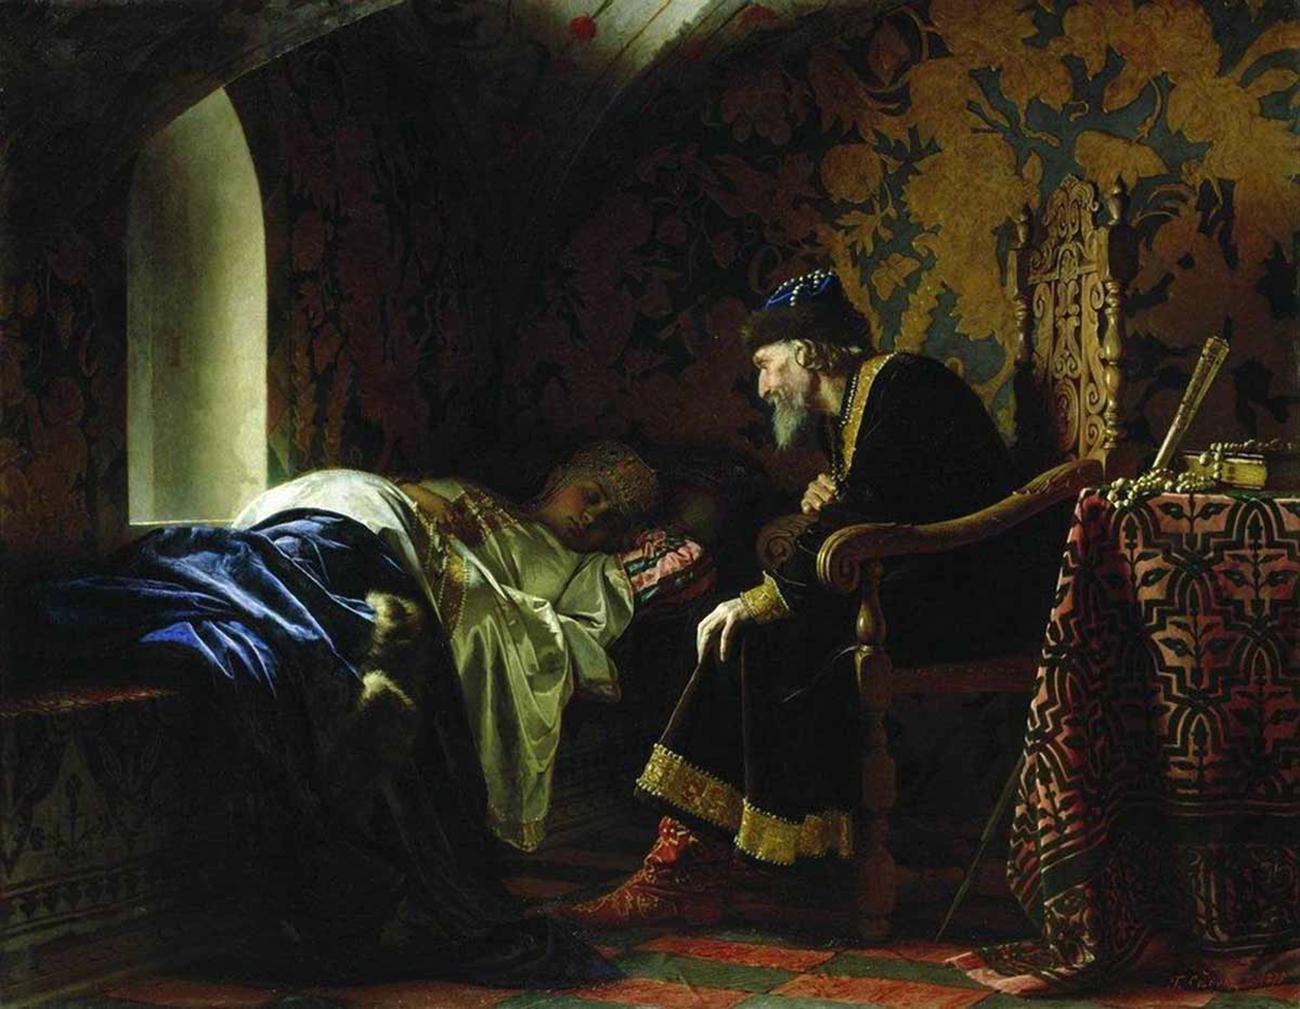 Ivan the Terrible and Vasilisa Lelentyeva, by Grigory Sedov. Source: State Russian Museum